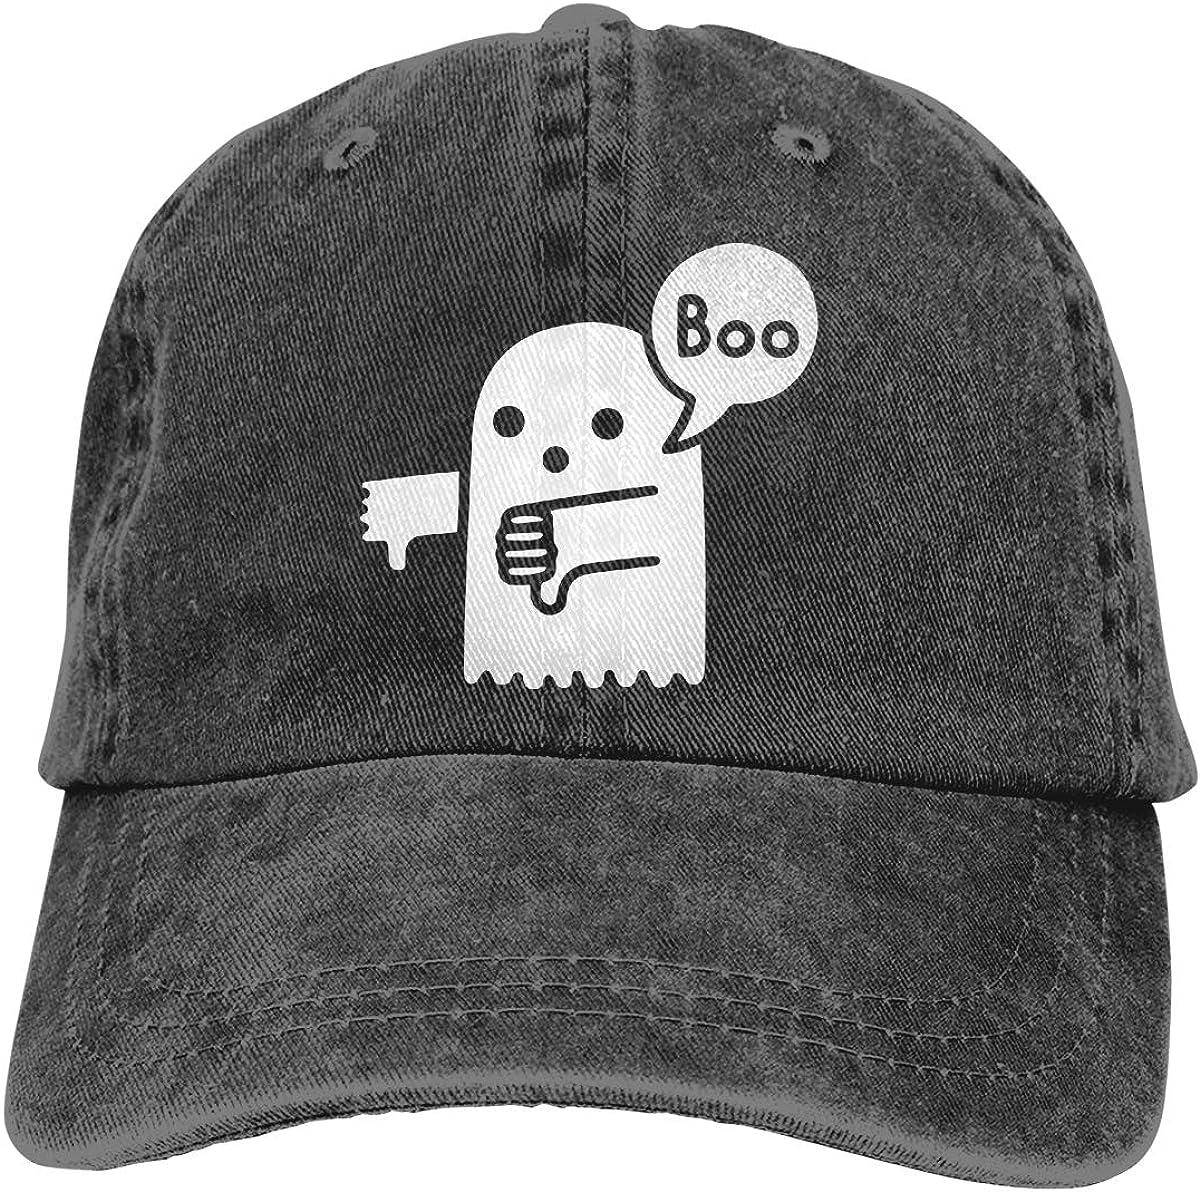 Ghost of Disapproval Unisex Custom Cowboy Hip Hop Cap Adjustable Baseball Cap